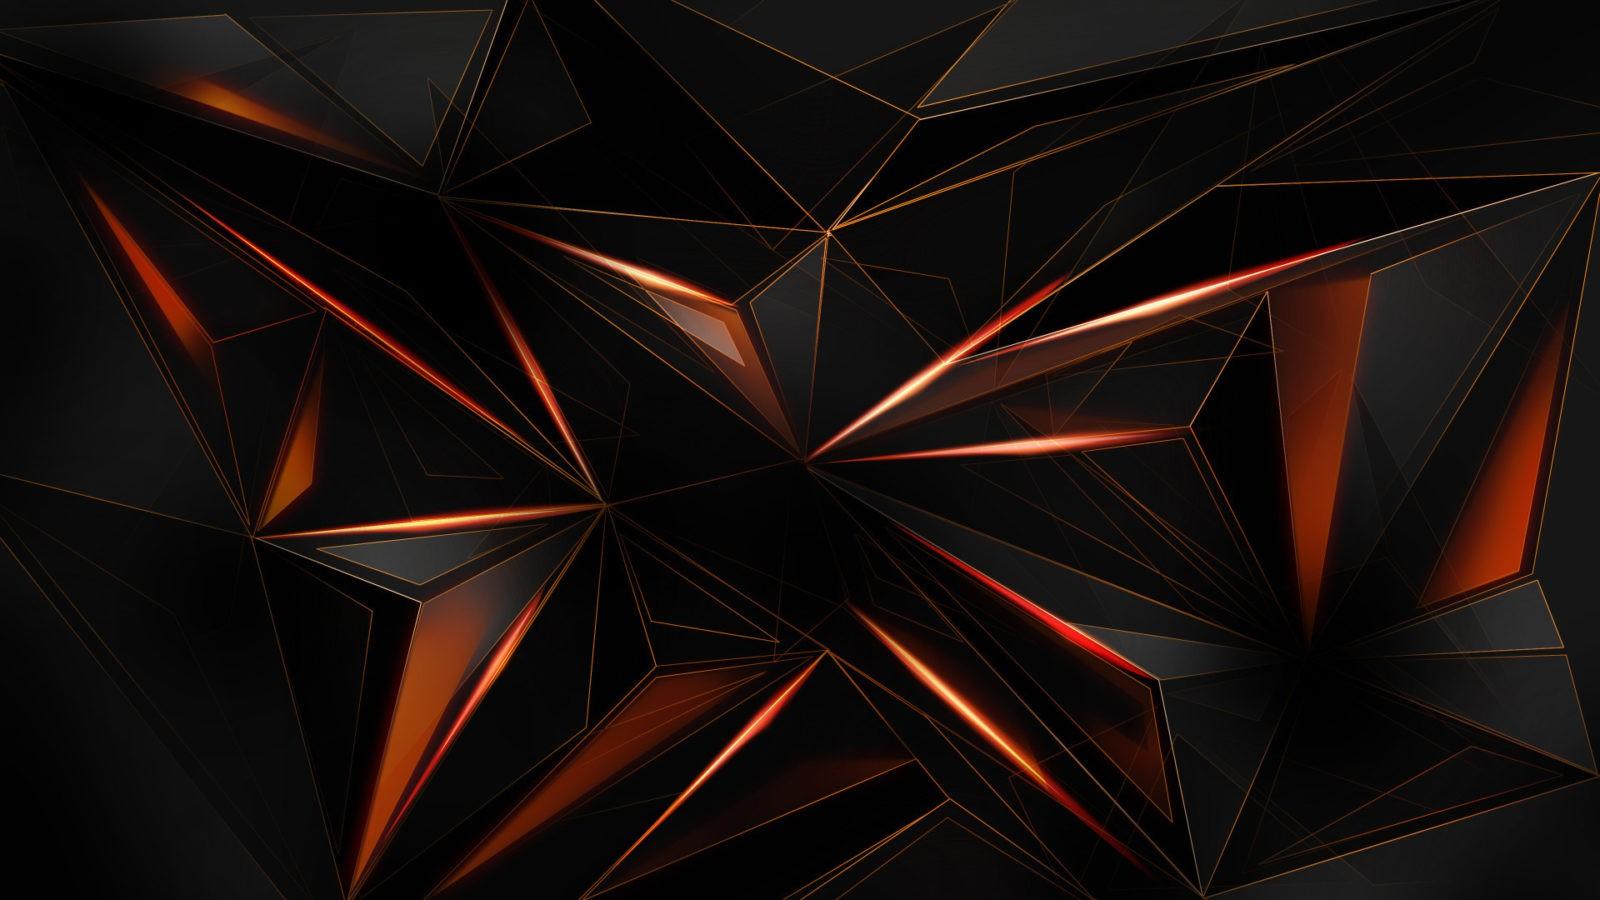 Black Abstract desktop background